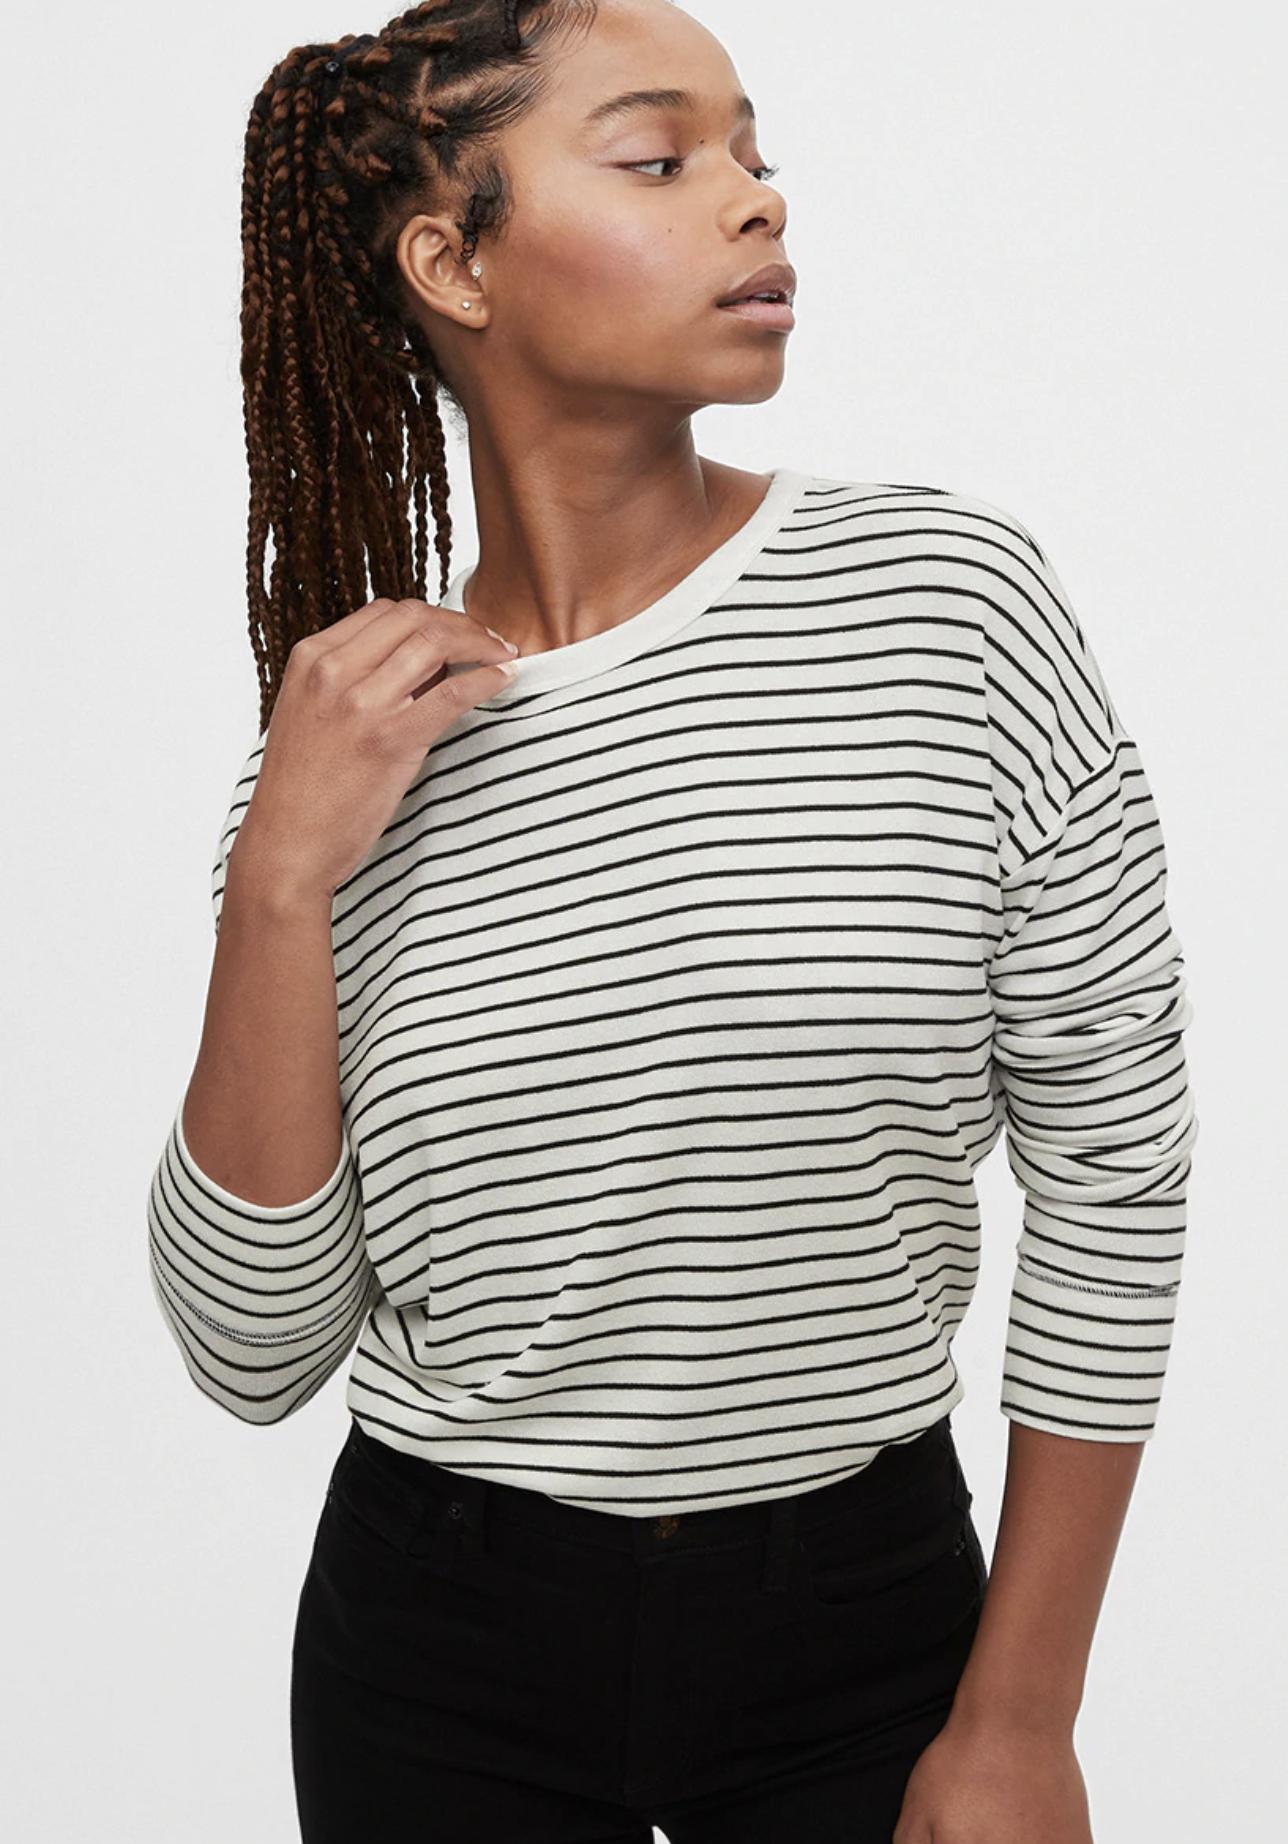 Jersey de mujer de rayas con escote barco